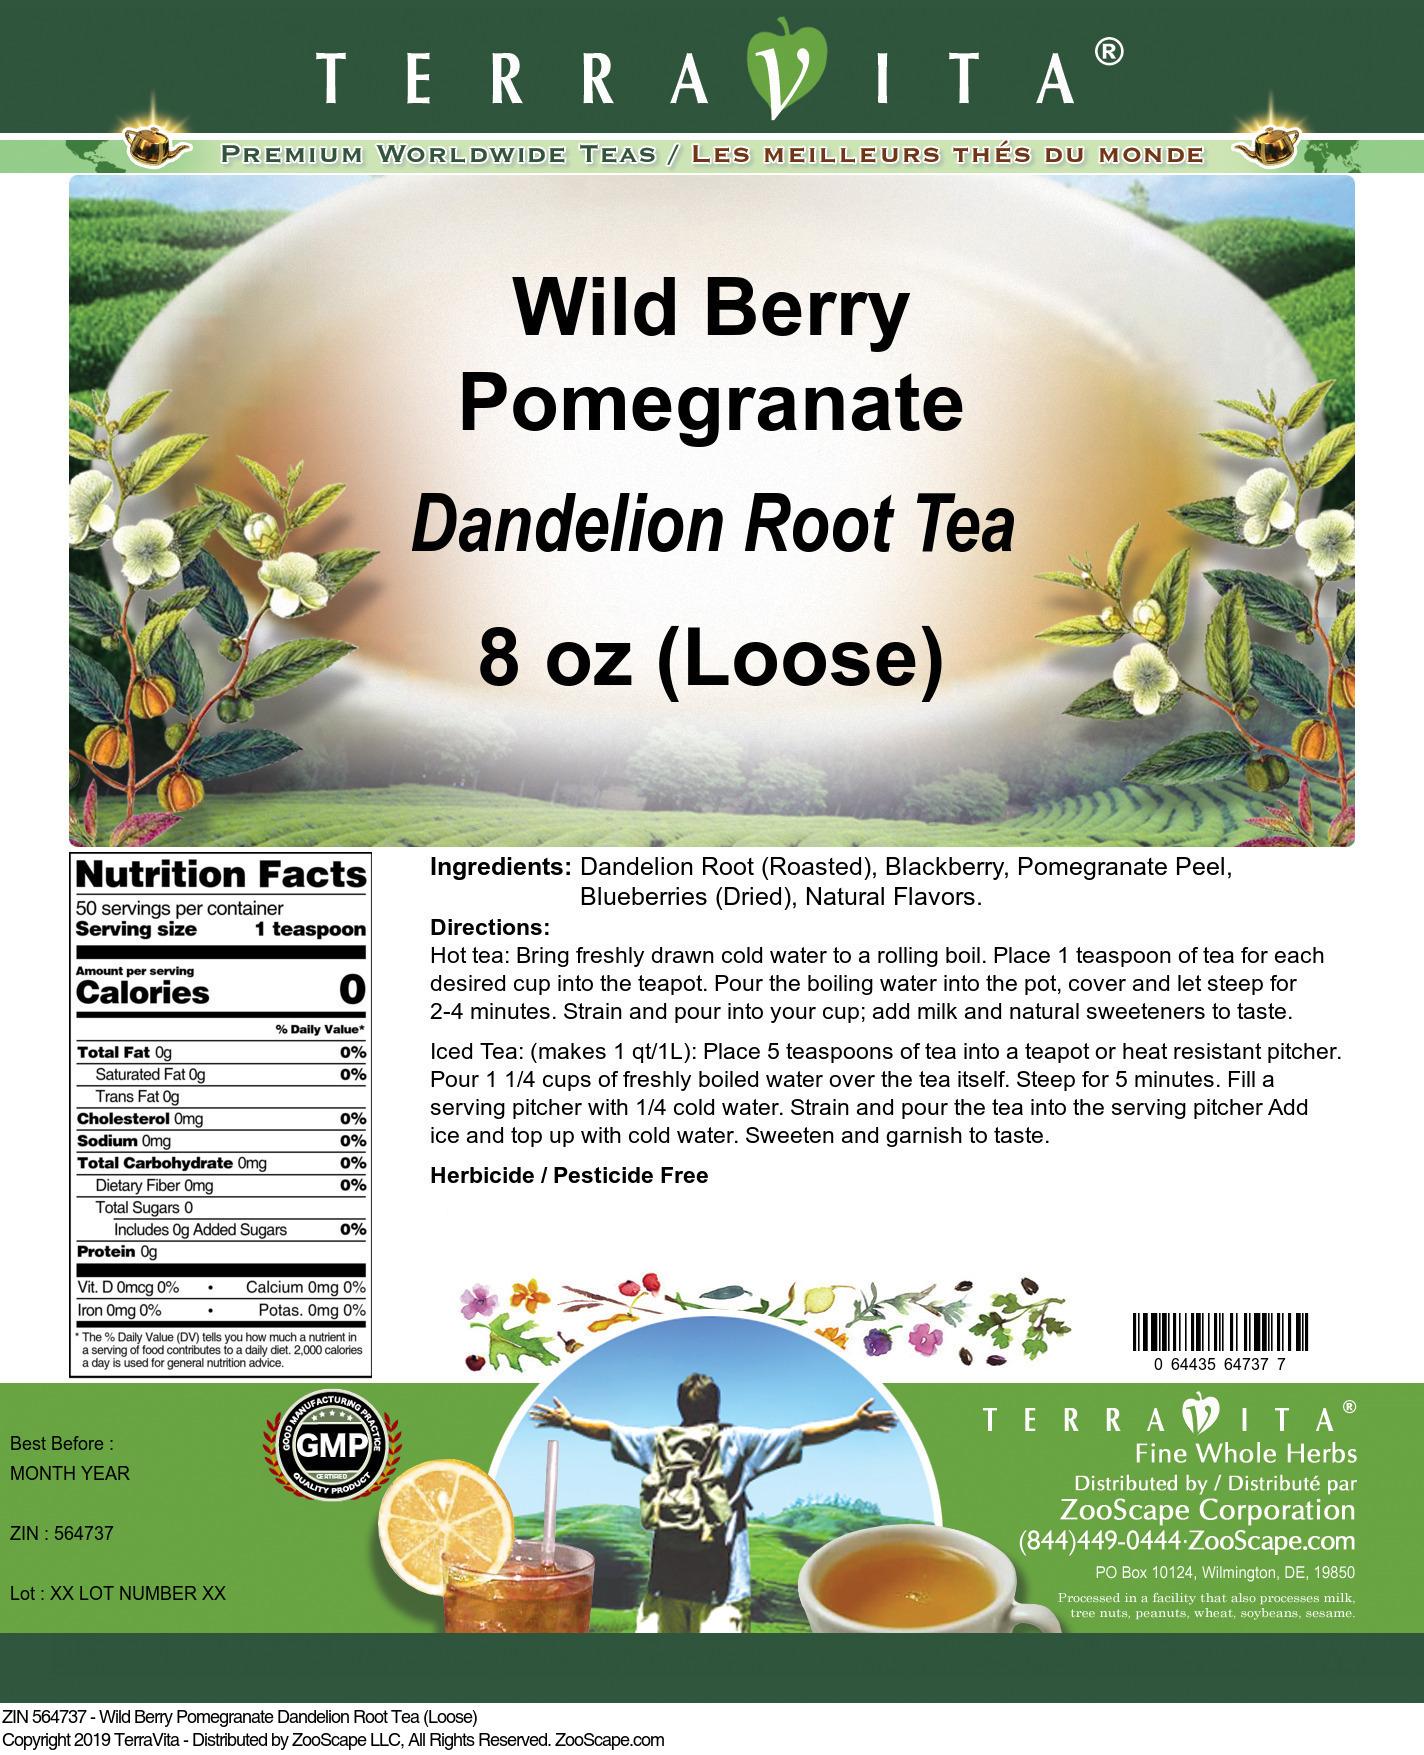 Wild Berry Pomegranate Dandelion Root Tea (Loose)